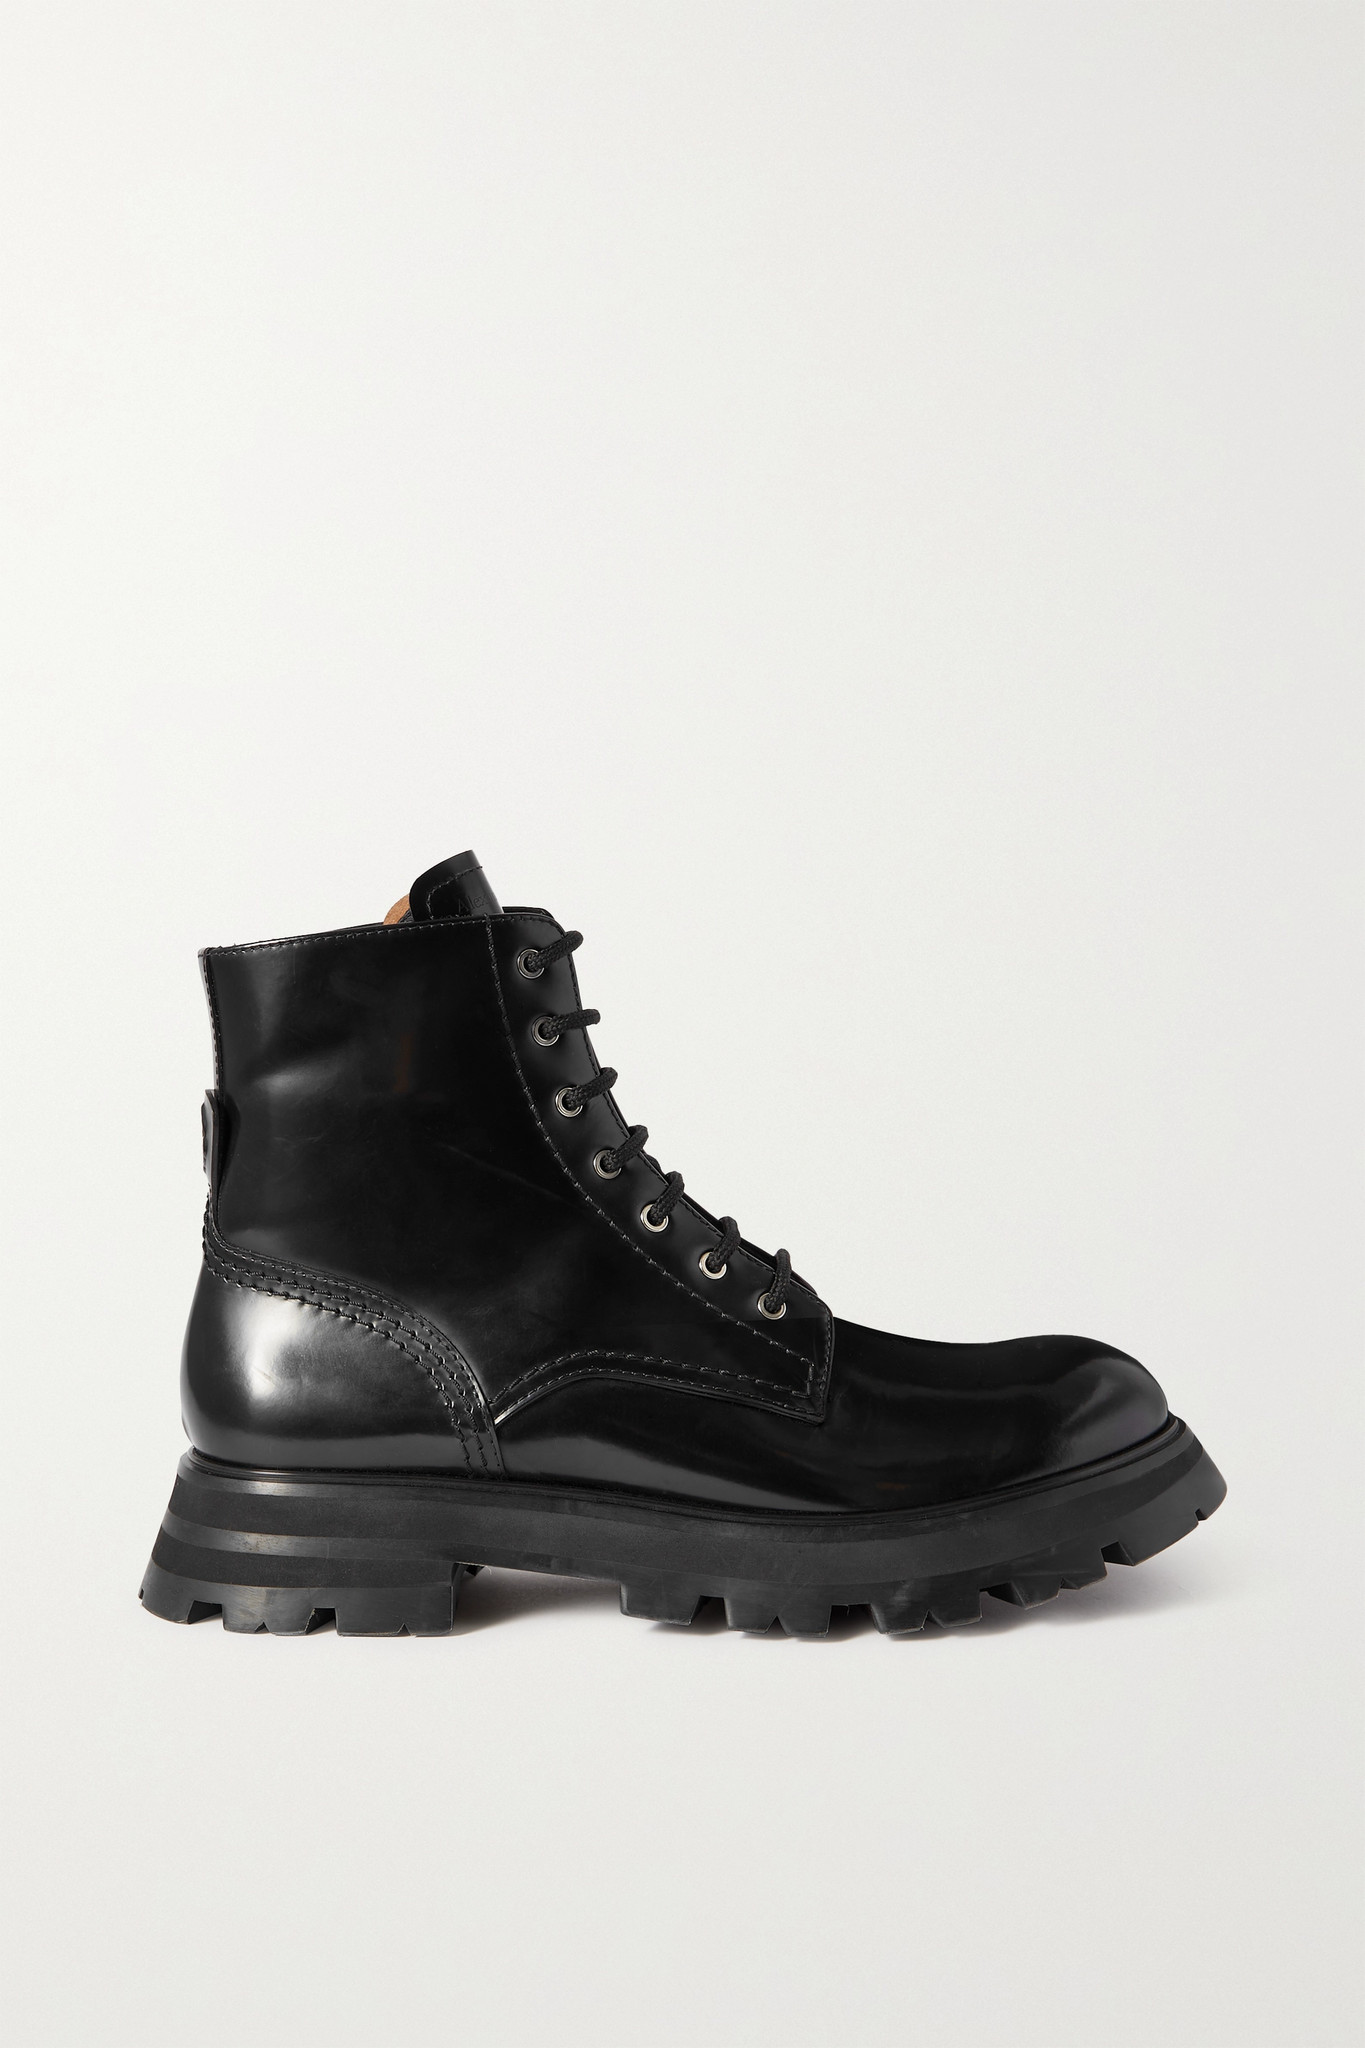 ALEXANDER MCQUEEN - Wander 亮面皮革厚底踝靴 - 黑色 - IT37